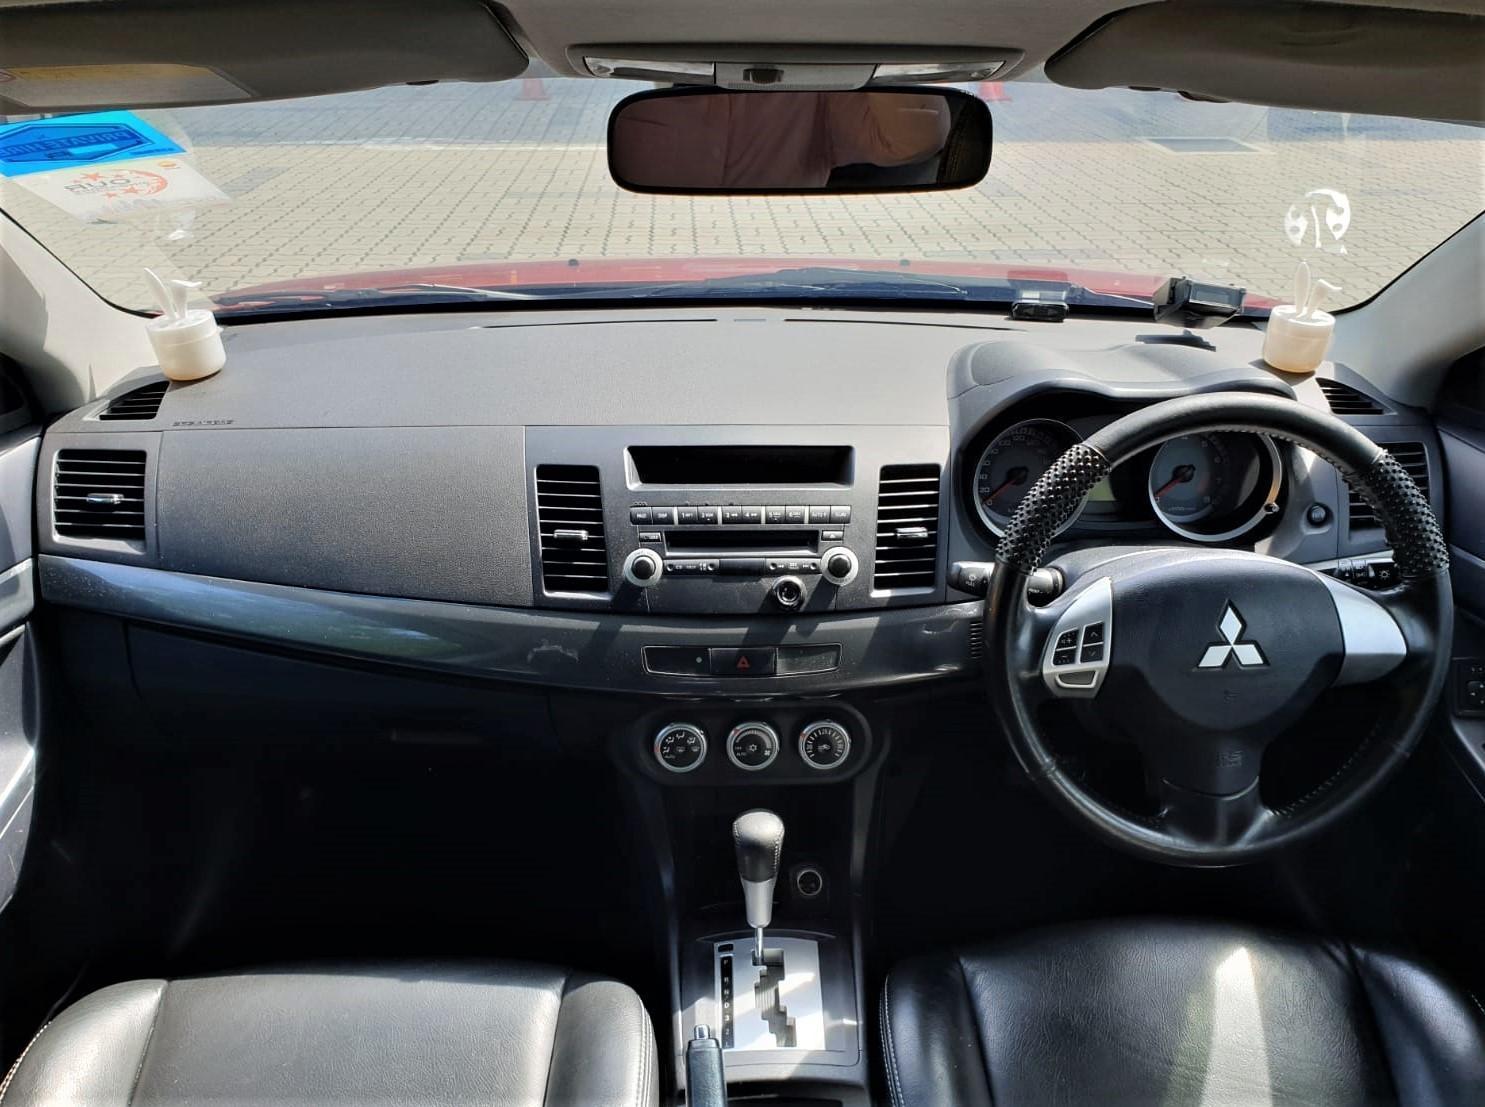 Mitsubishi Lancer EX 1.5A @ Best price! Free servicing!